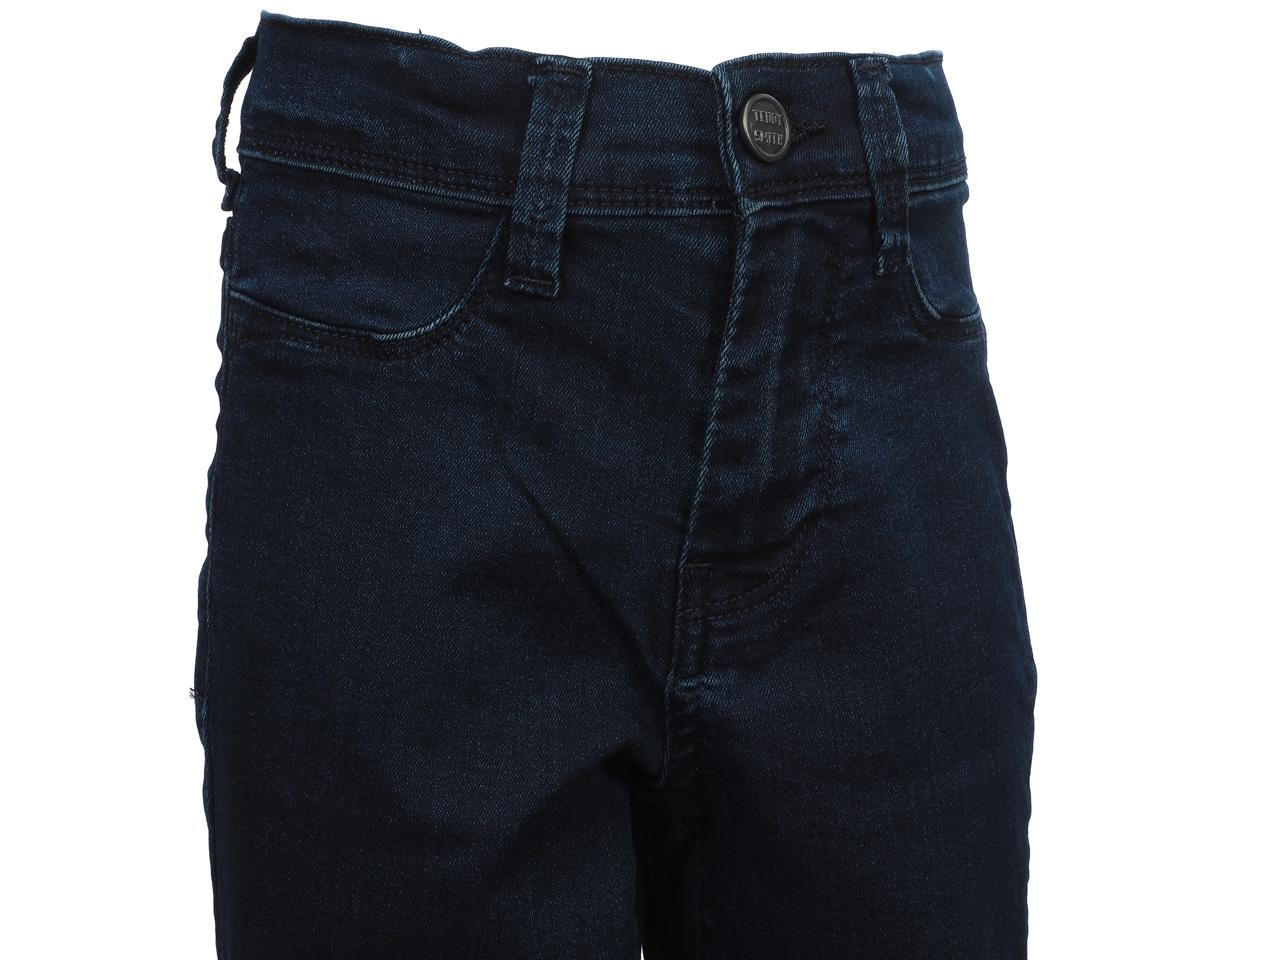 Pantalon-jeans-Teddy-smith-The-jeg-navy-jeans-girl-Bleu-24306-Neuf miniature 2